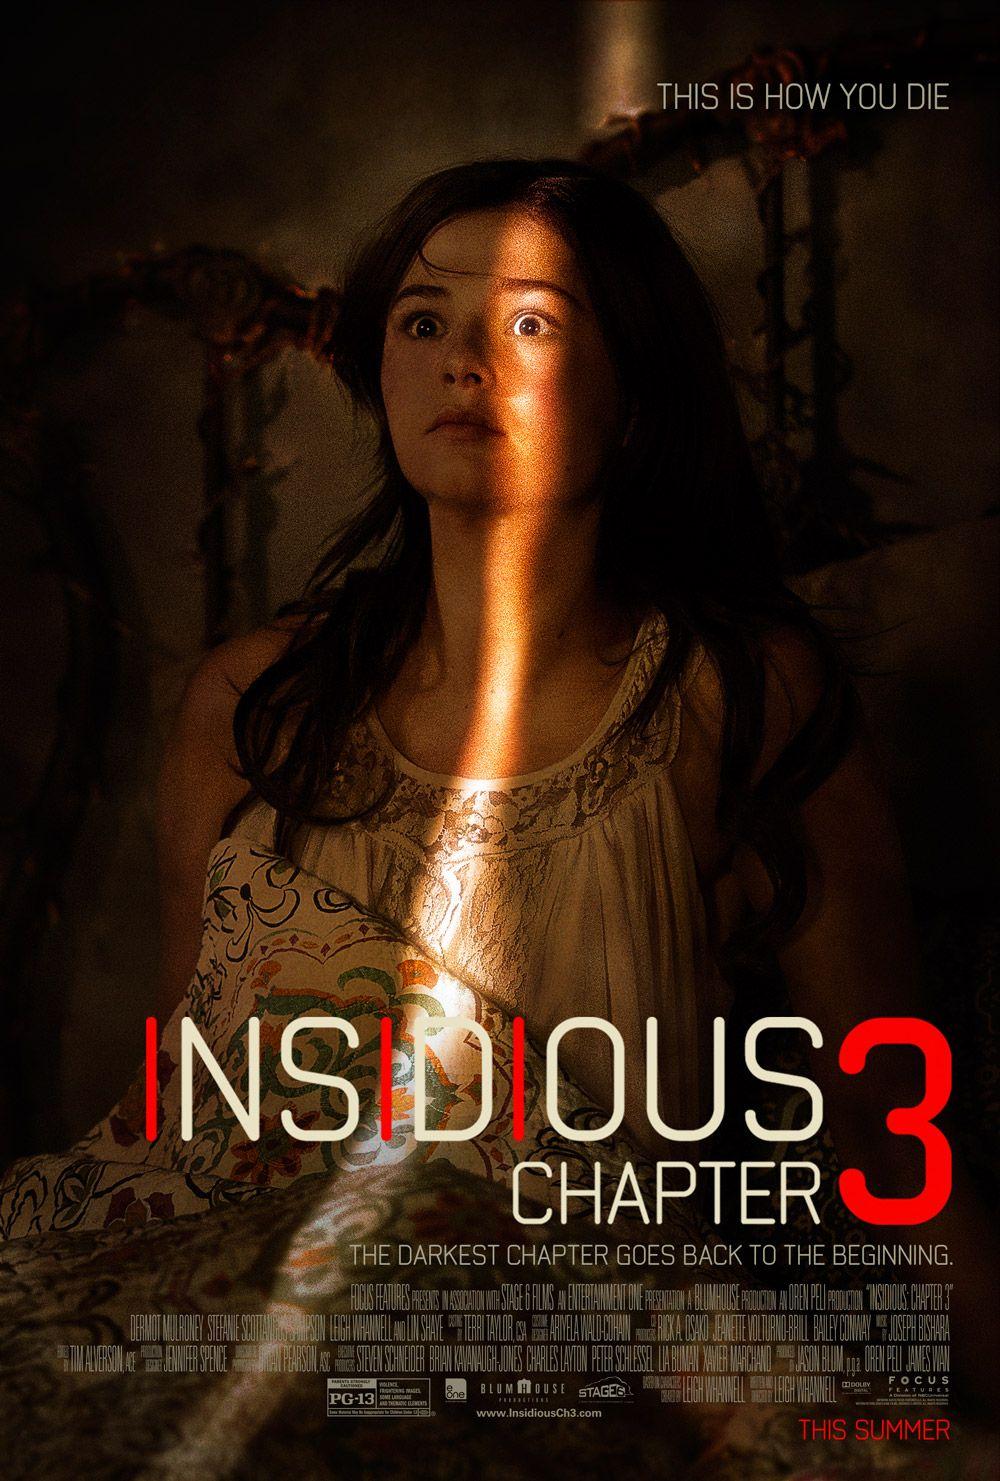 Horror Sales Insidious 3 Makes 10 000 000 Opening Night Is 1 At The Box Office Horror Society Insidious Movie Thriller Movies Insidious